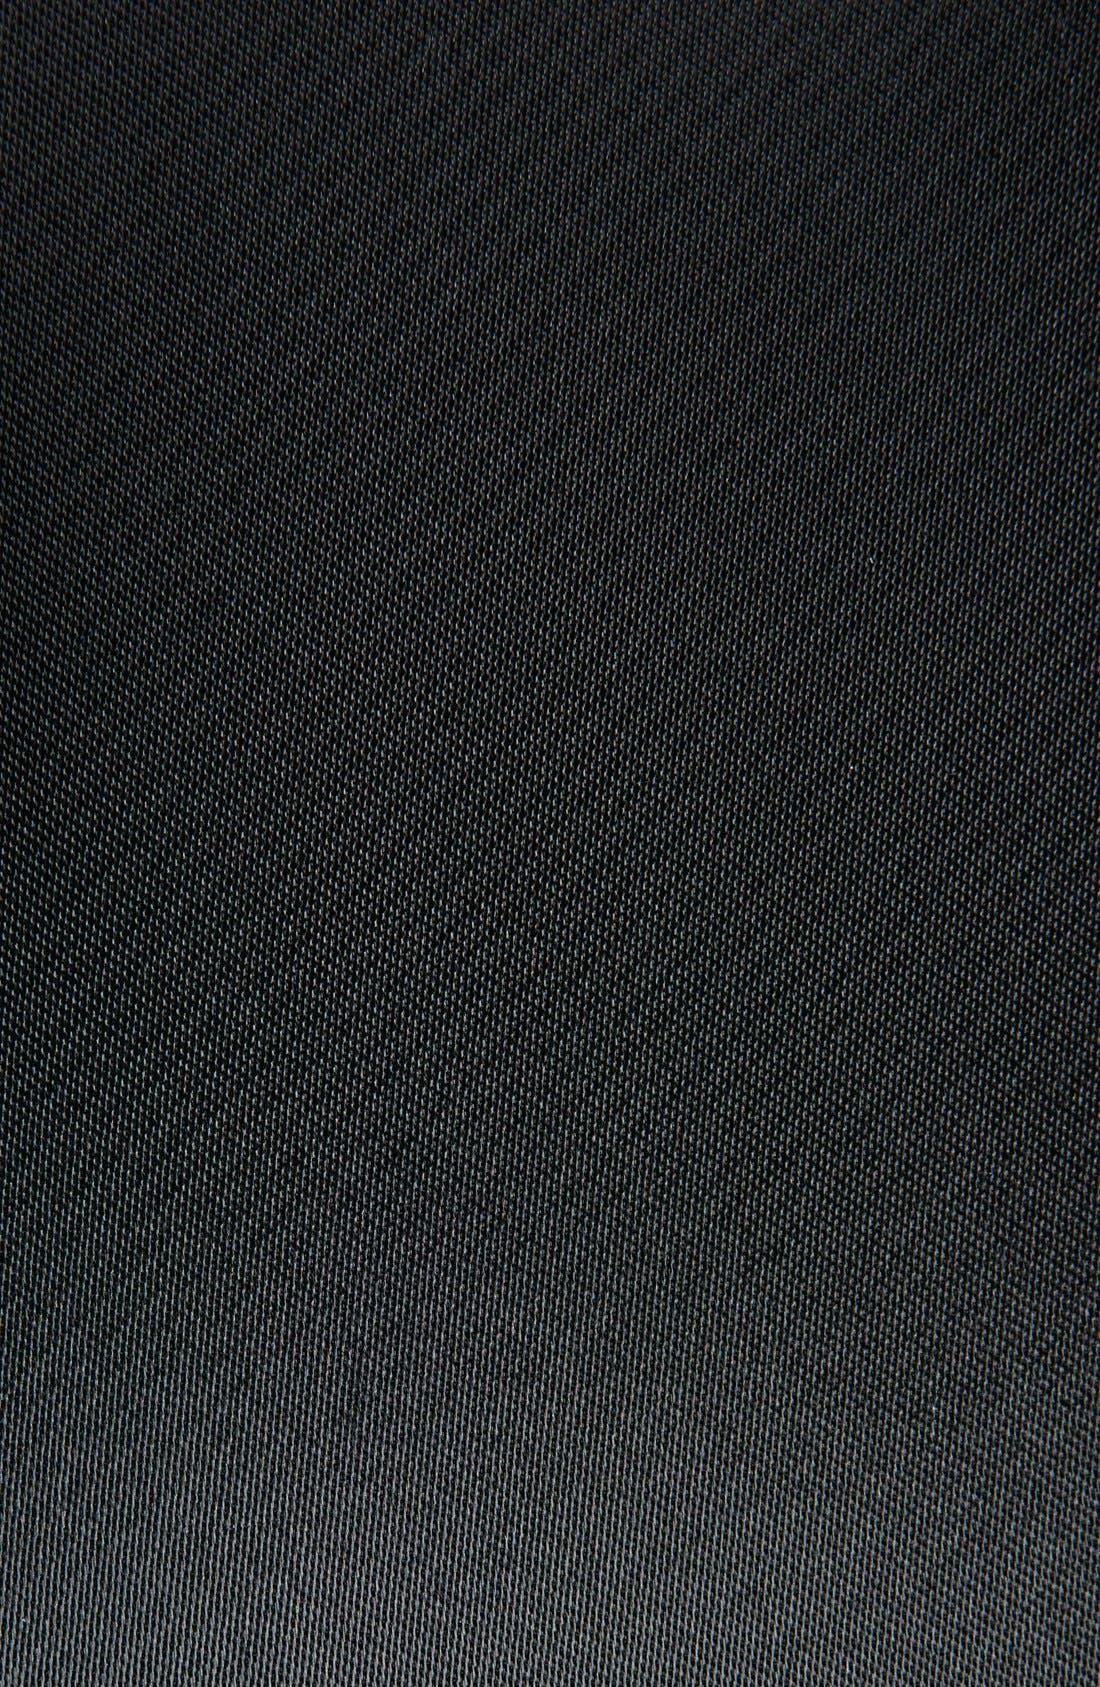 Alternate Image 3  - Saint Laurent 'Teddy' Oversize Patch Satin Bomber Jacket